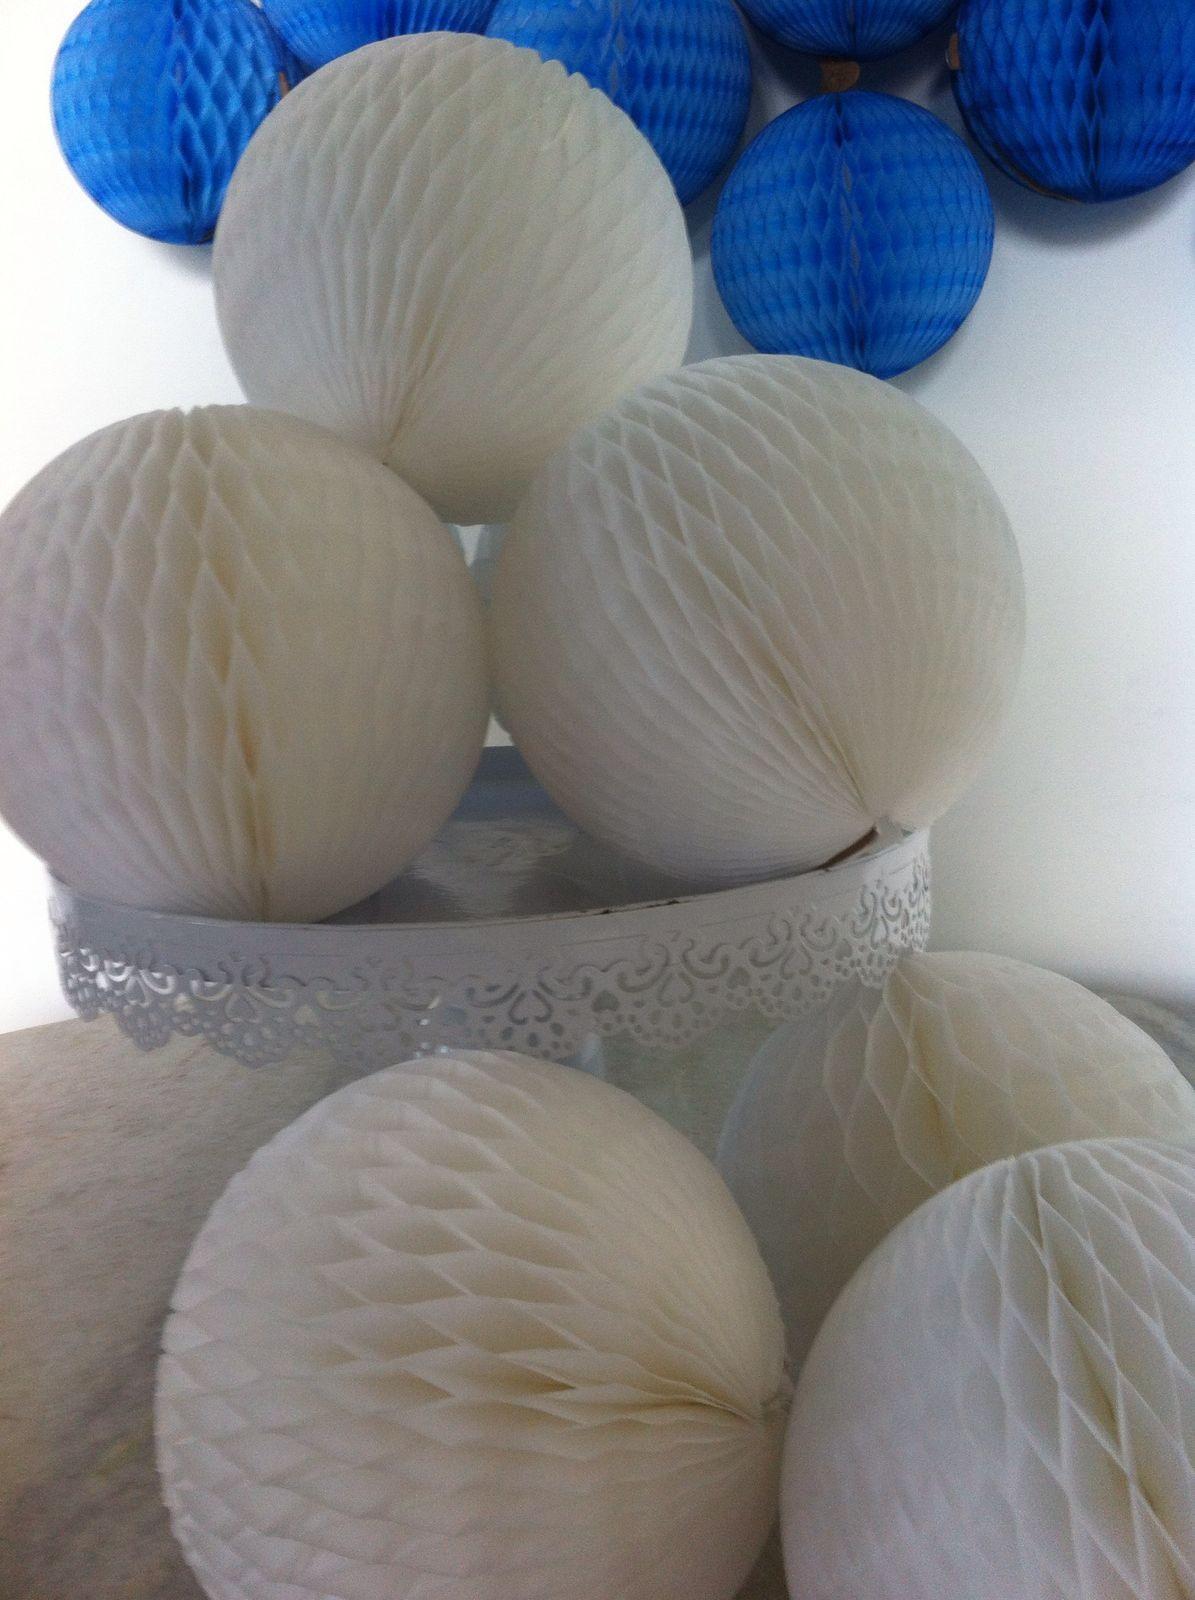 d29e49e0bd485 Bolas de Papel de seda Diversas cores - bola personalizada no Elo7 ...